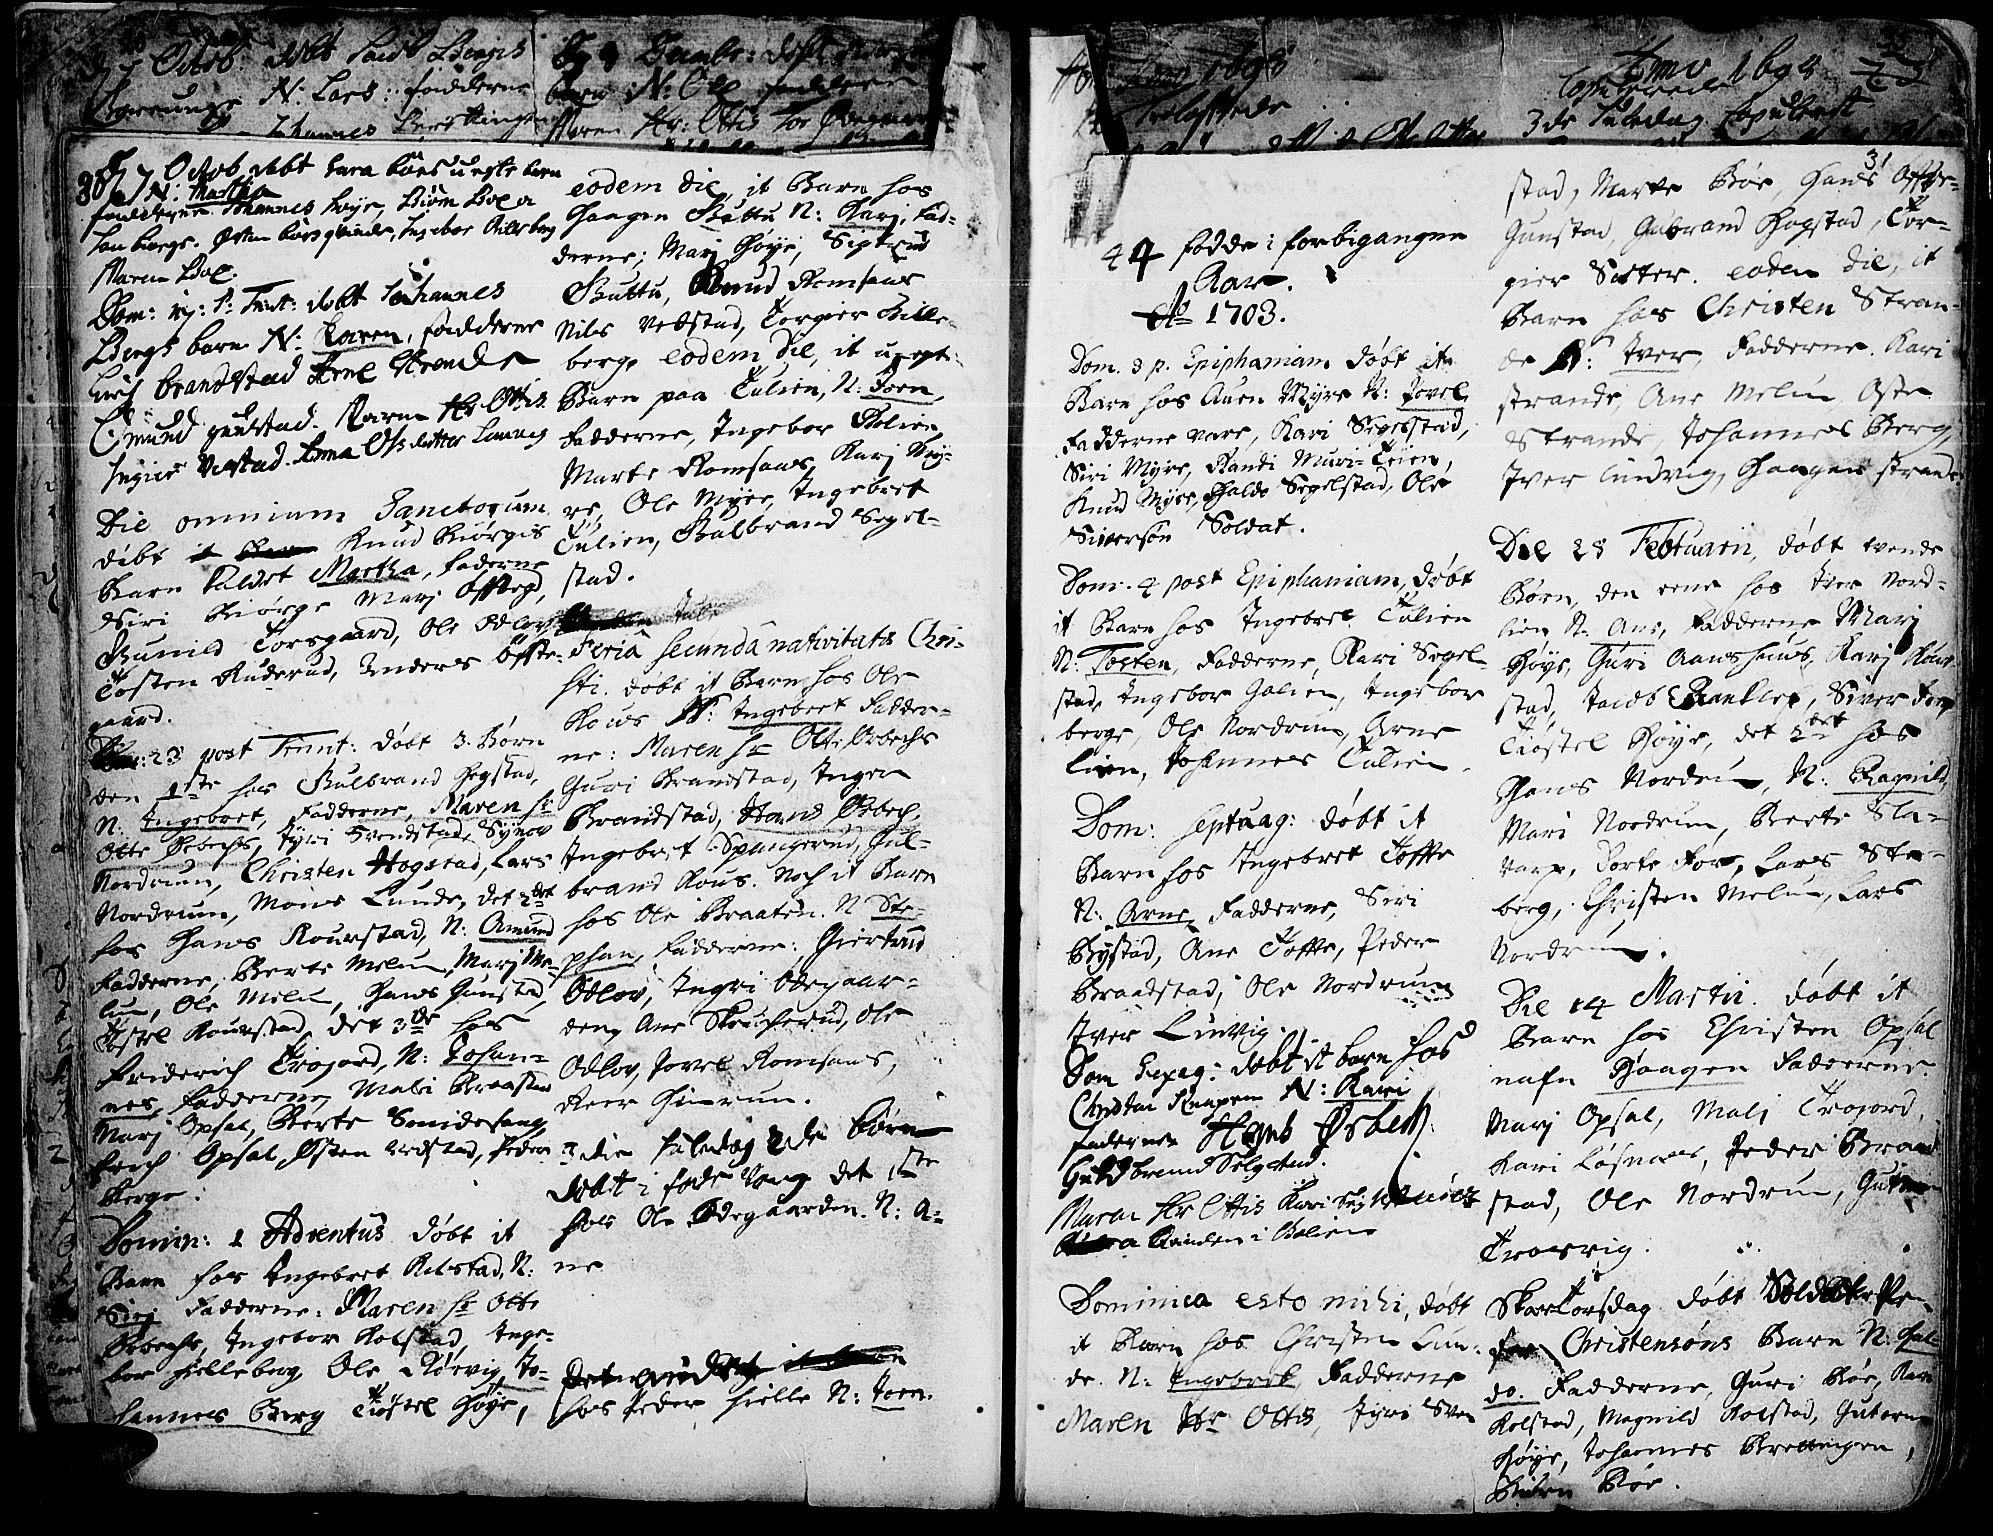 SAH, Ringebu prestekontor, Ministerialbok nr. 1, 1696-1733, s. 30-31